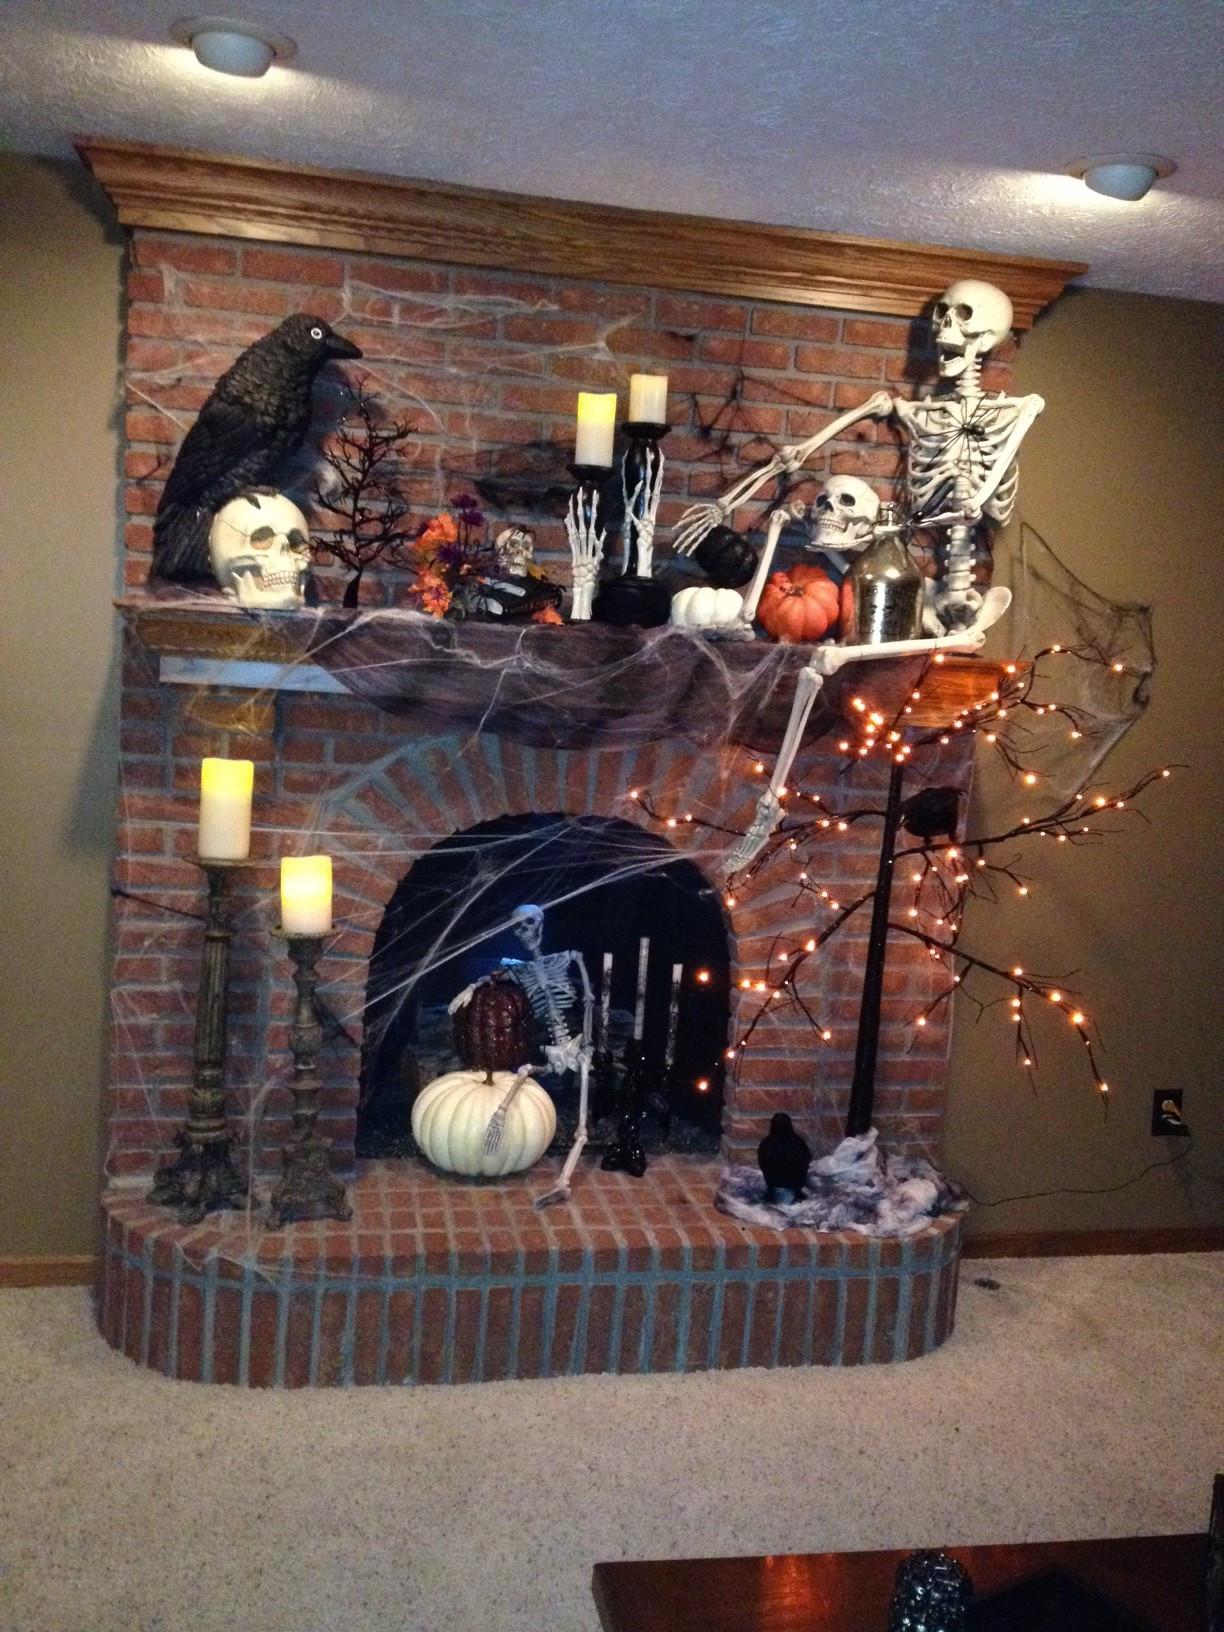 Halloween Fireplace Decorations  1000 ideas about Halloween Fireplace on Pinterest